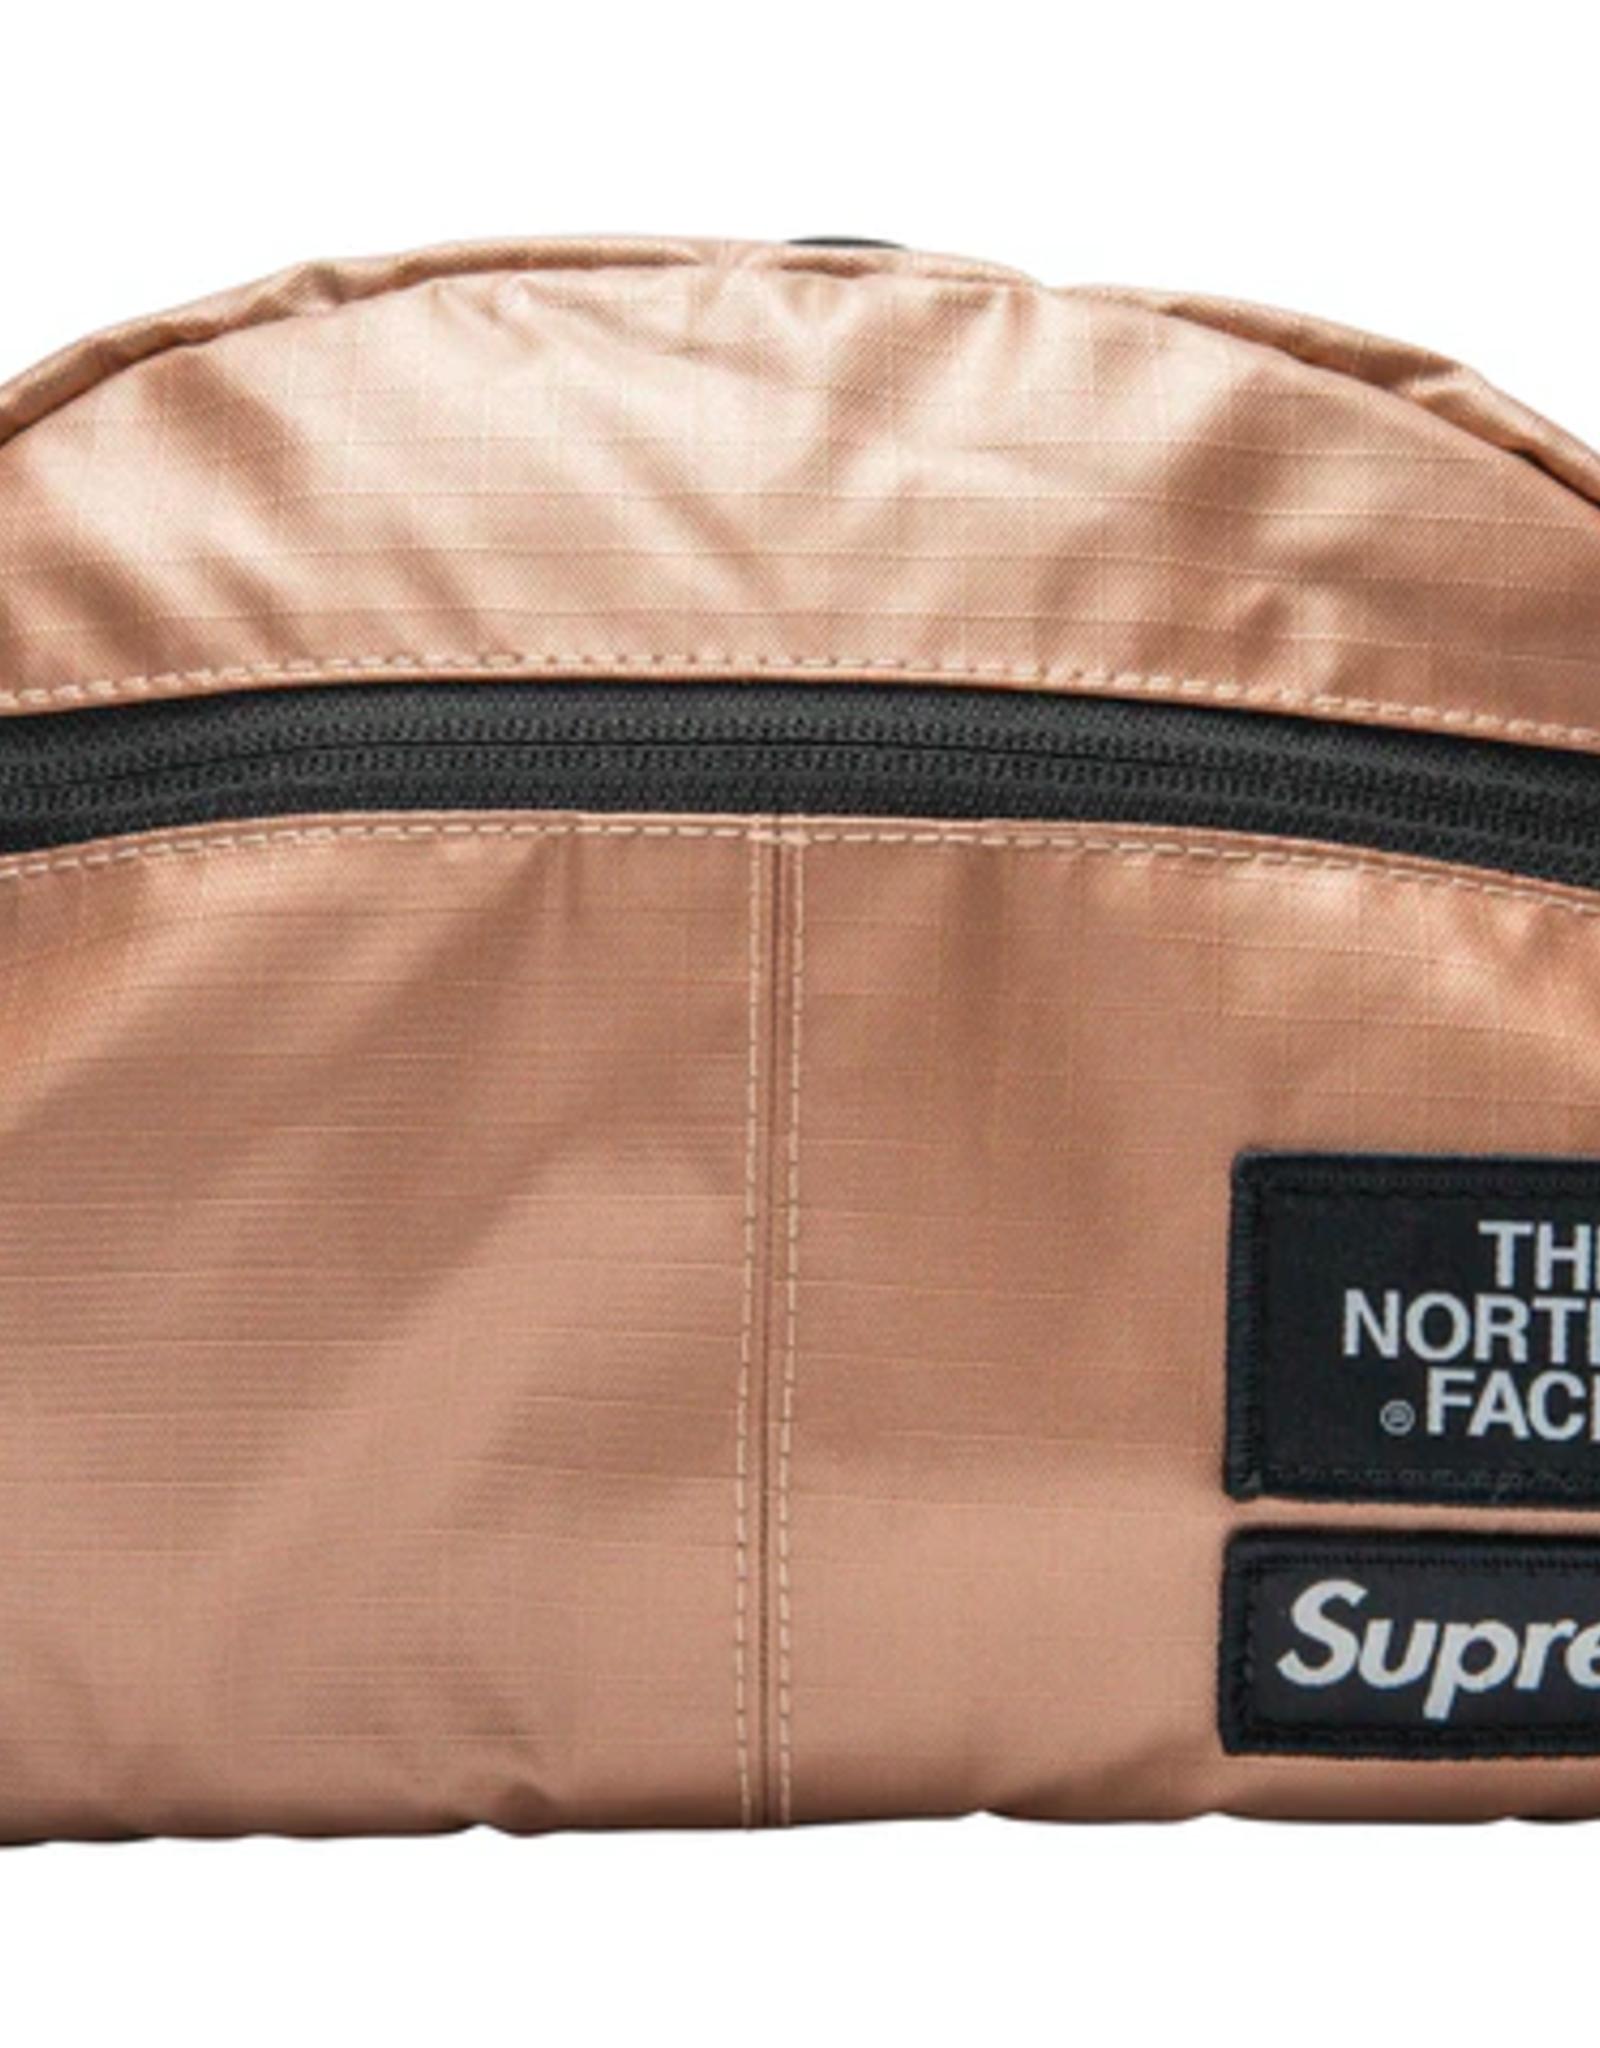 SUPREME Supreme The North Face Metallic Roo II Lumbar Pack Rose Gold